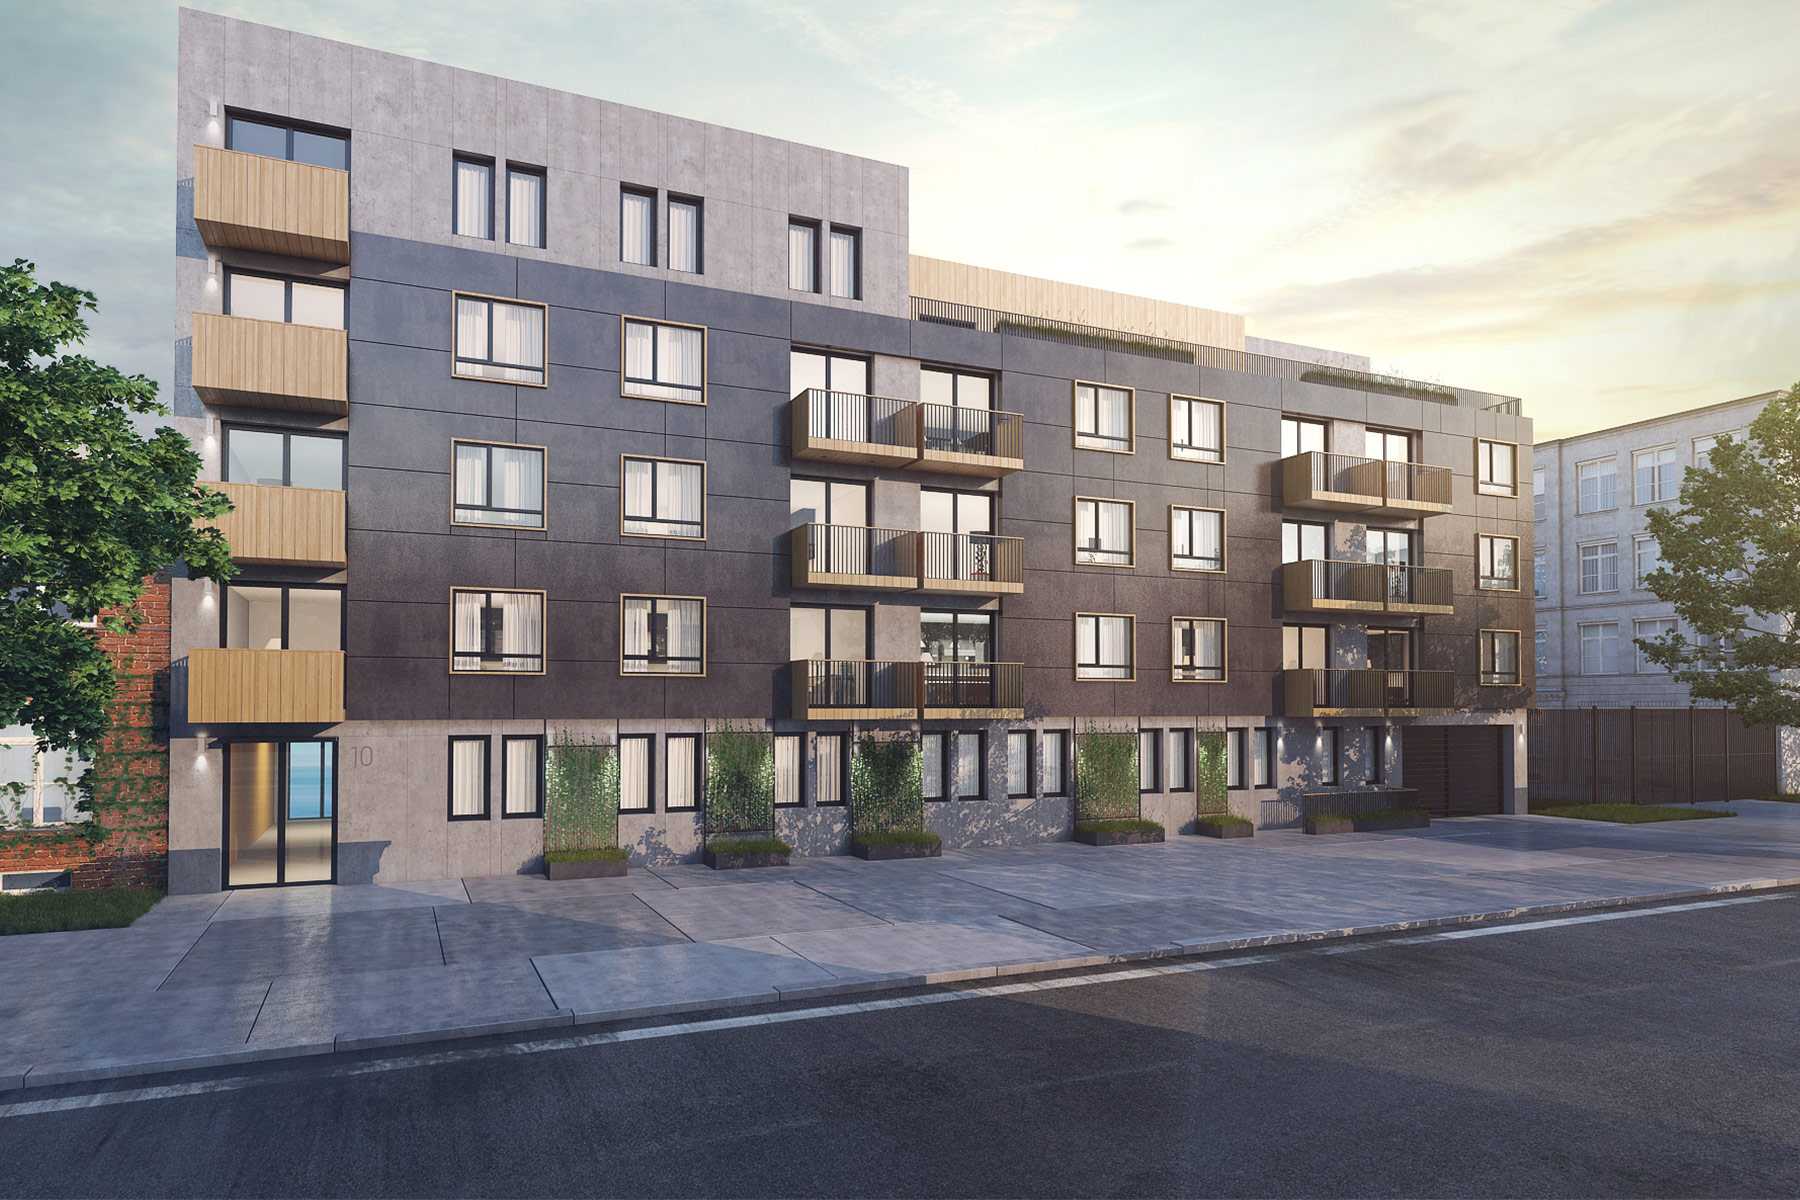 10 Lexington Avenue, rendering by StudiosC